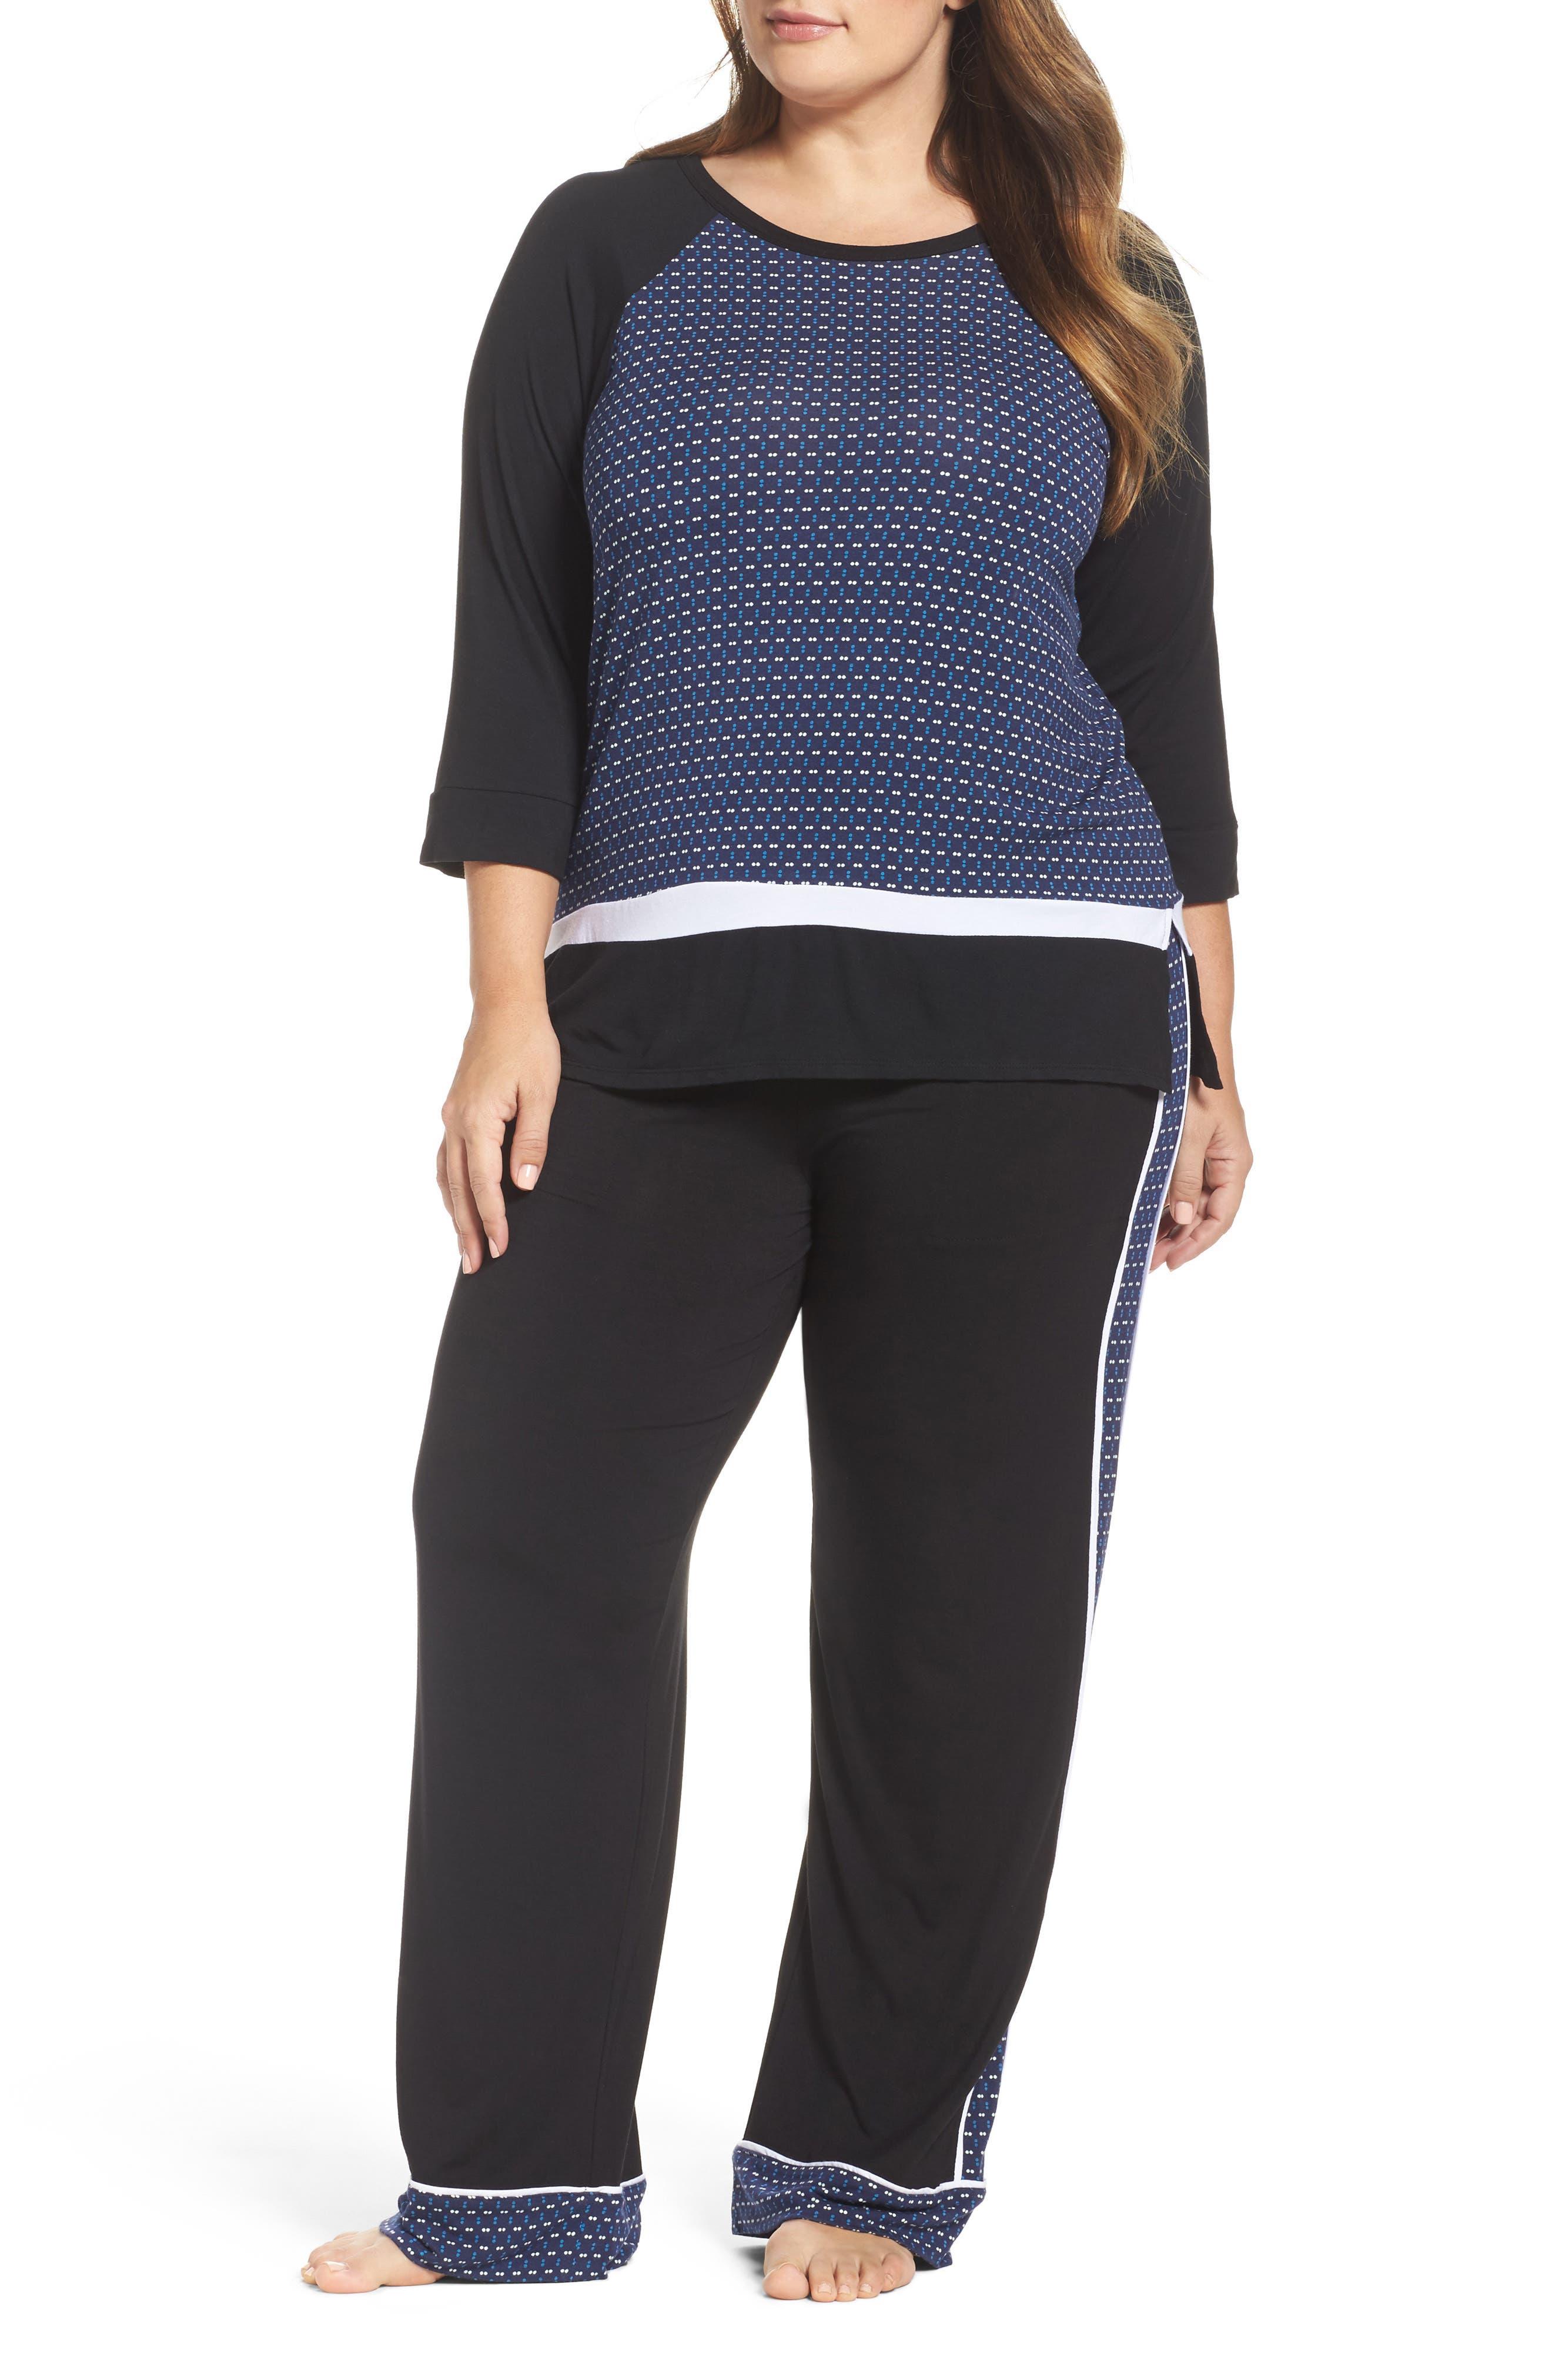 DKNY Sleep Shirt & Pajama Pants (Plus Size)